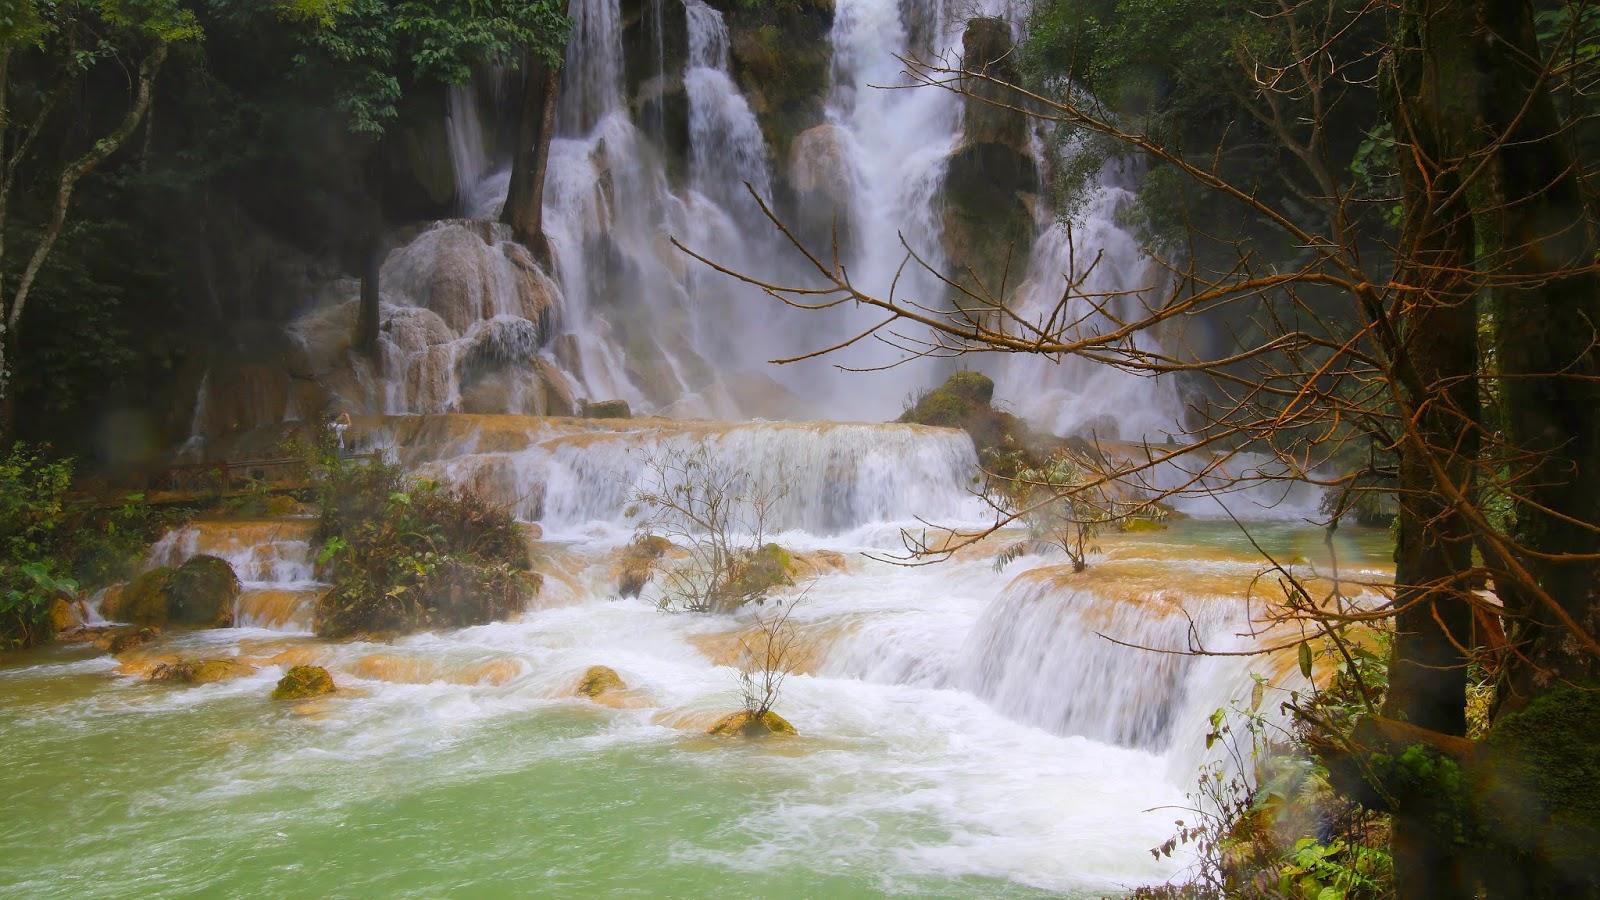 LAOS; Las cataratas Kuang Si en Luang Prabang